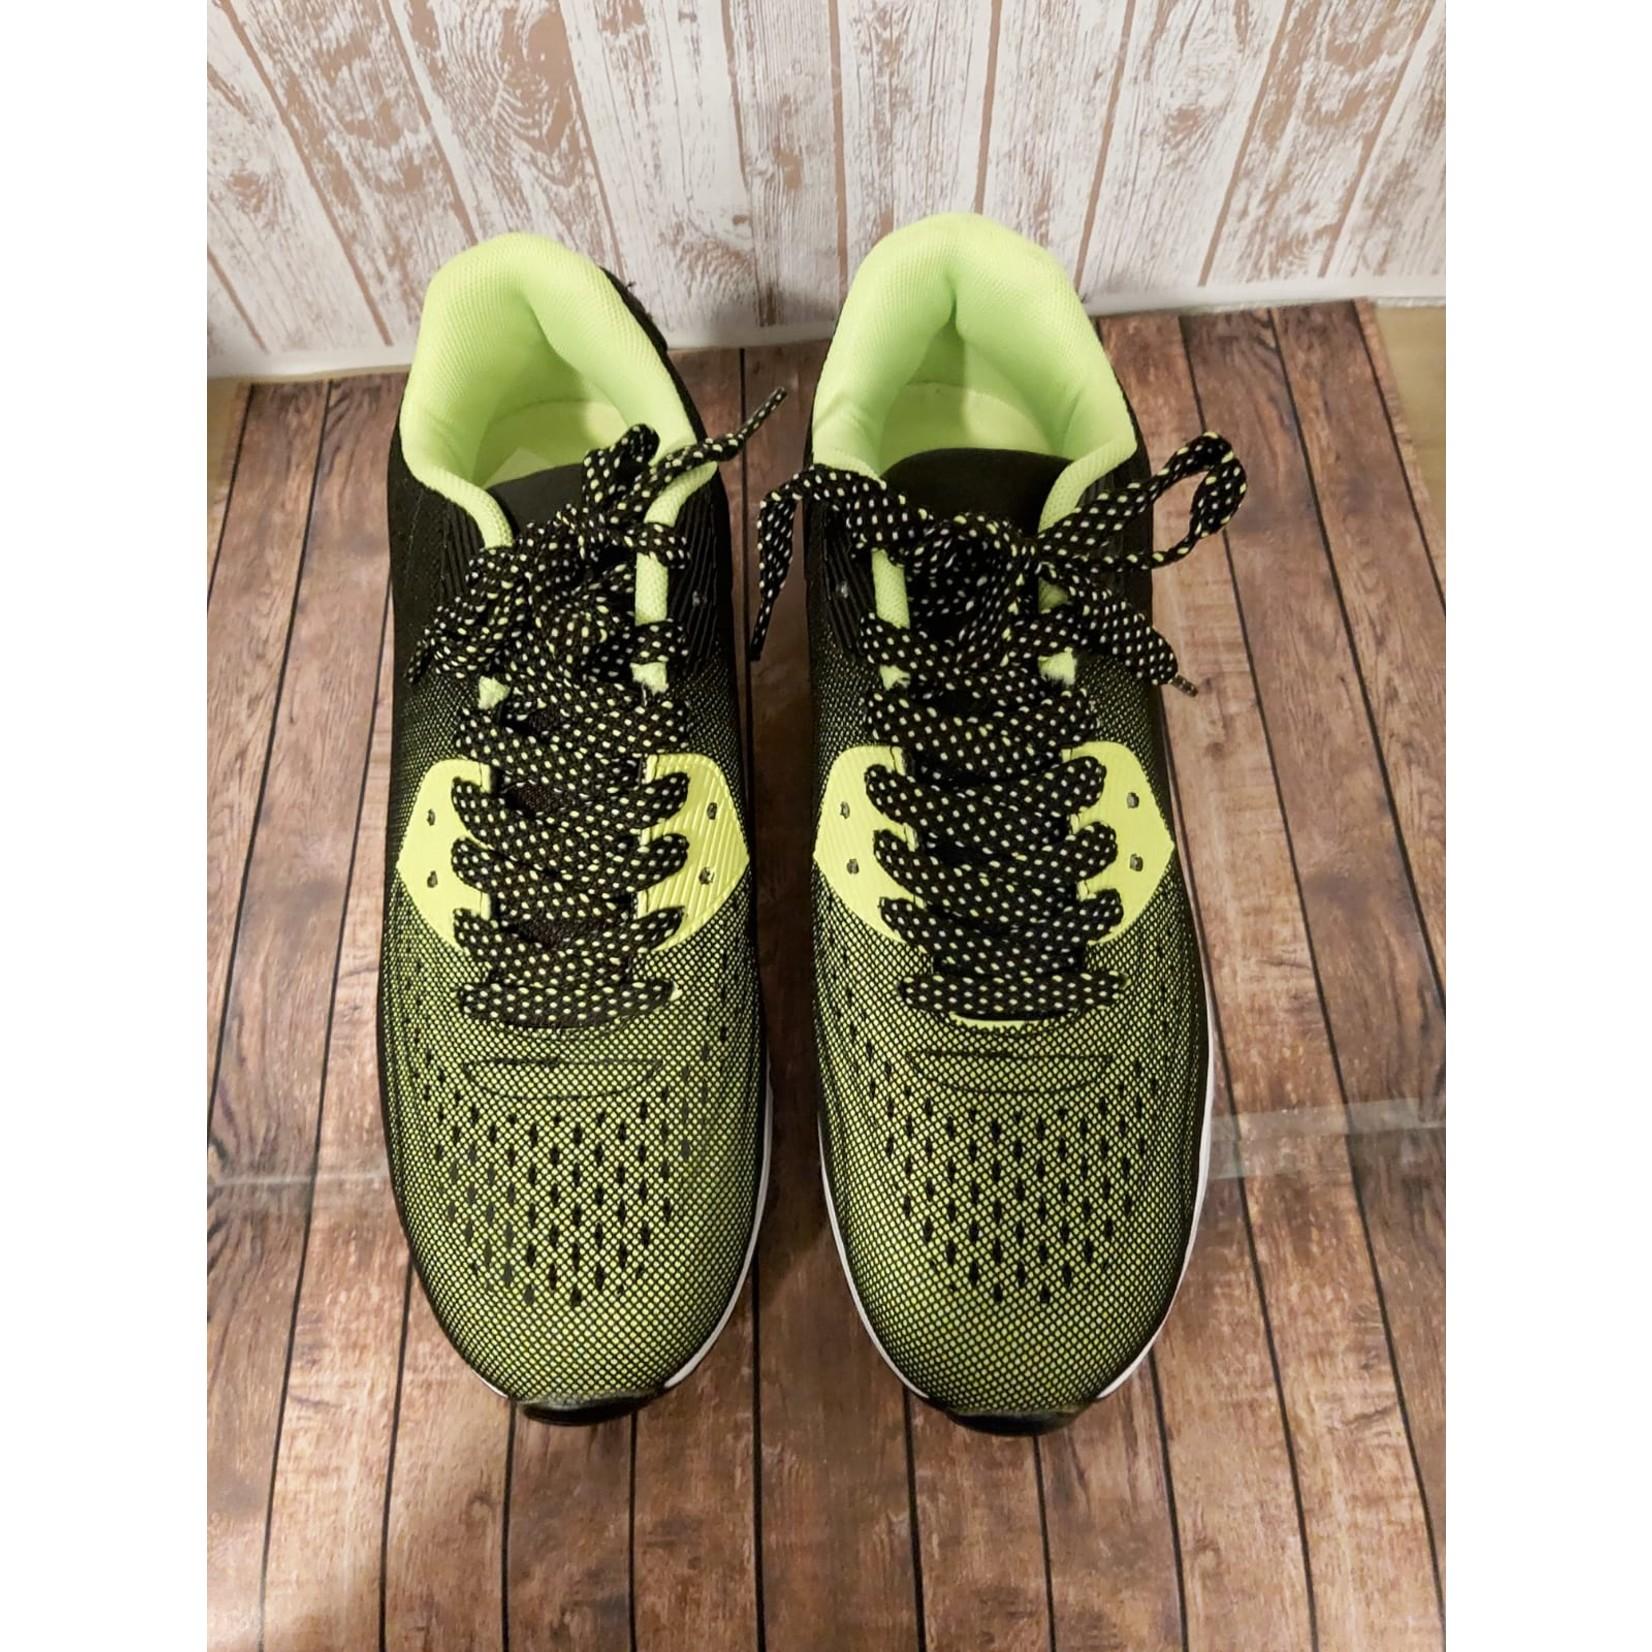 Sportieve Sneaker unisex Groen/Zwart met witte zool.